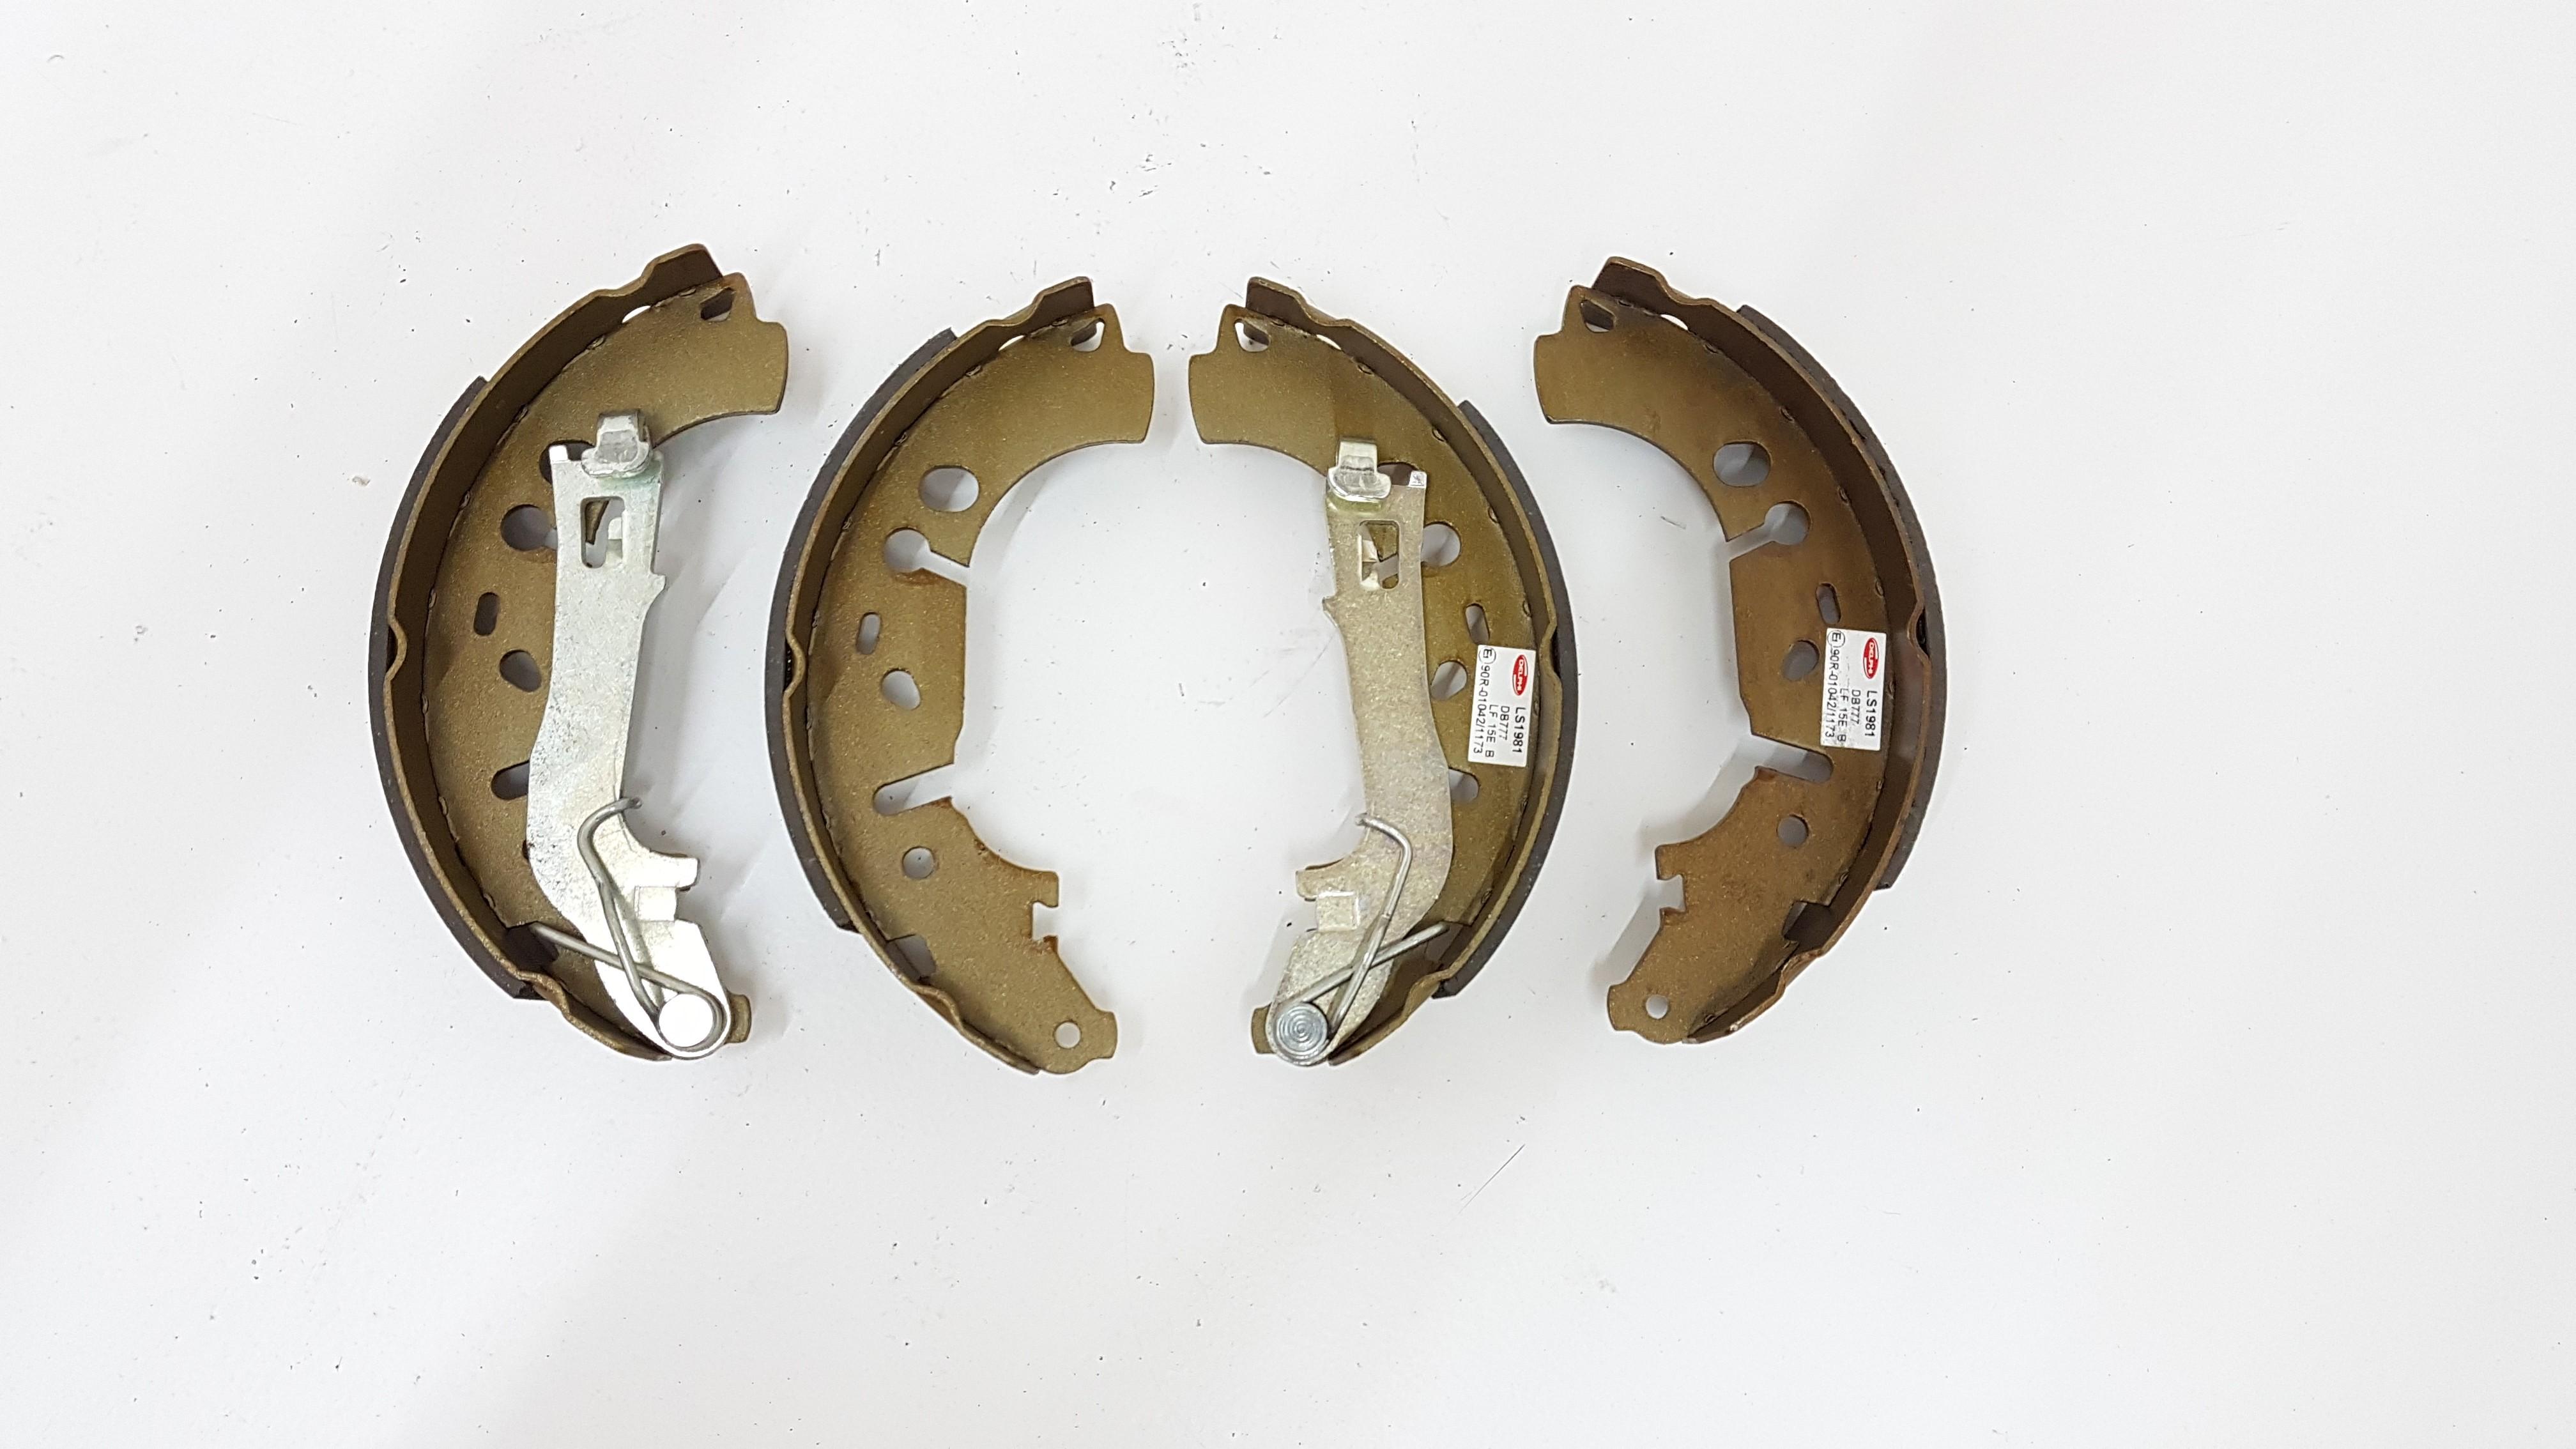 Rear Delphi Brake Shoes Full Axle Braking Set Fits Fiat Opel Vauxhall